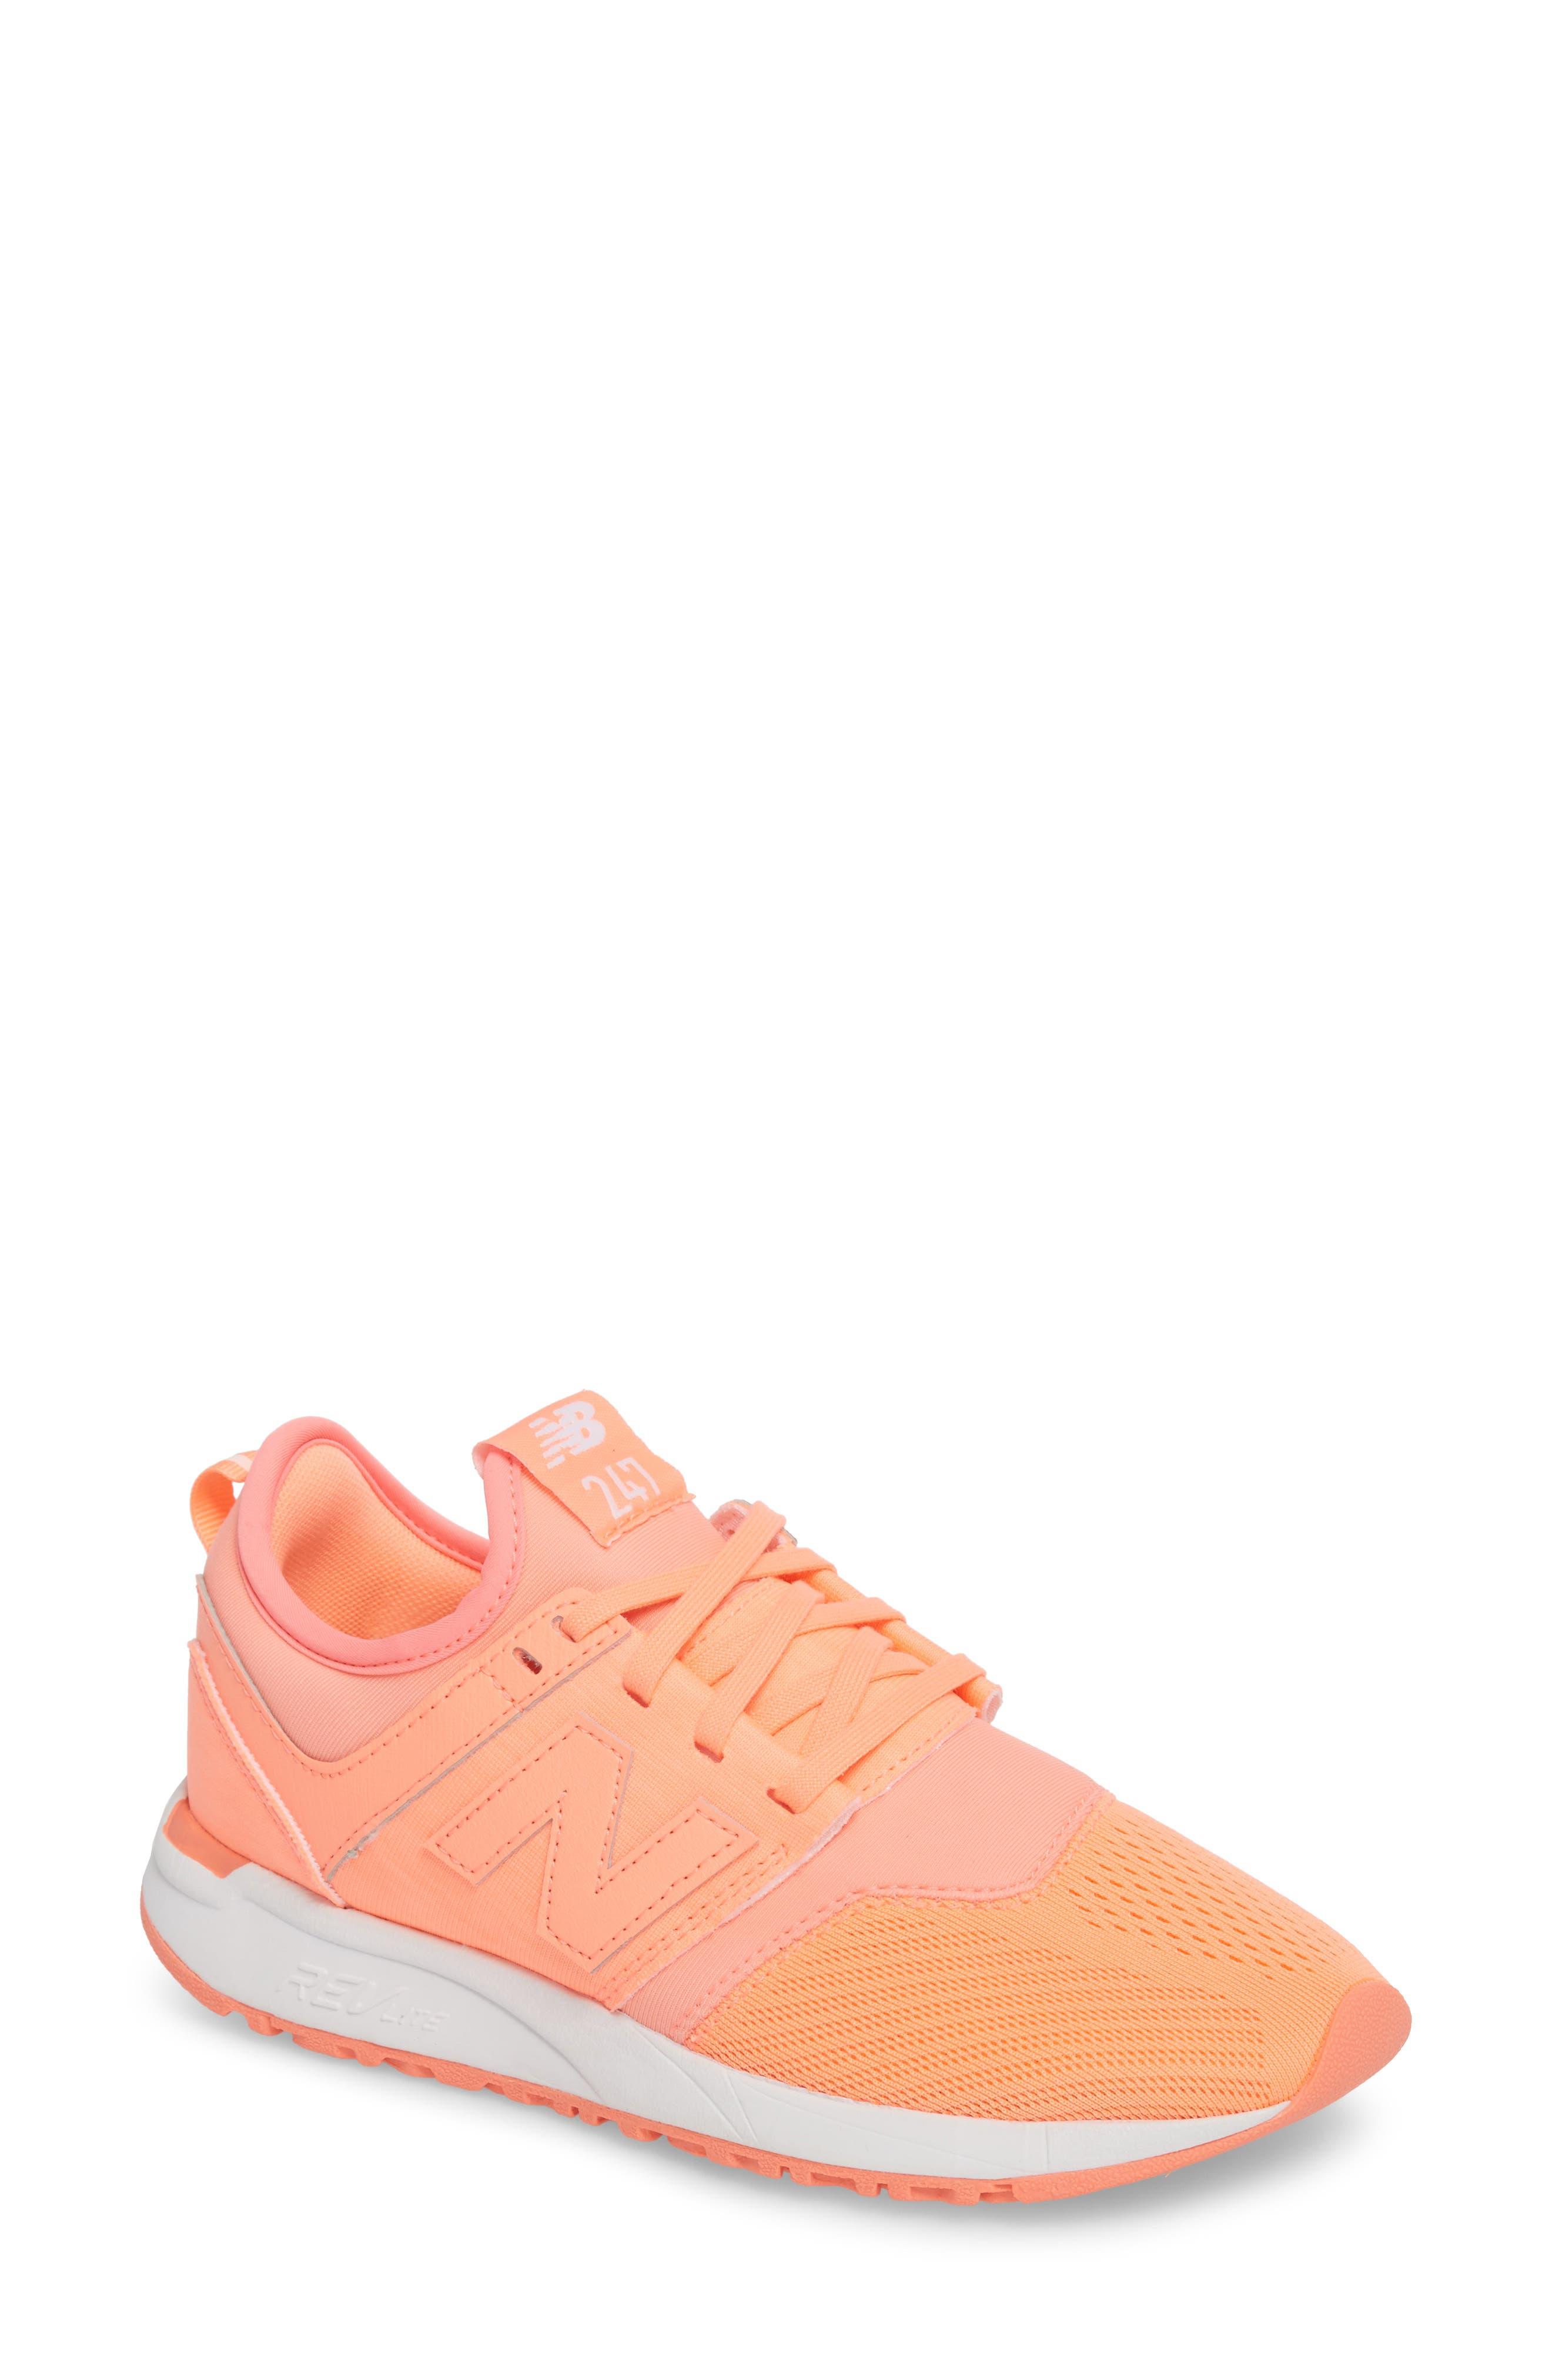 247 Classic Sneaker,                         Main,                         color, Fiji